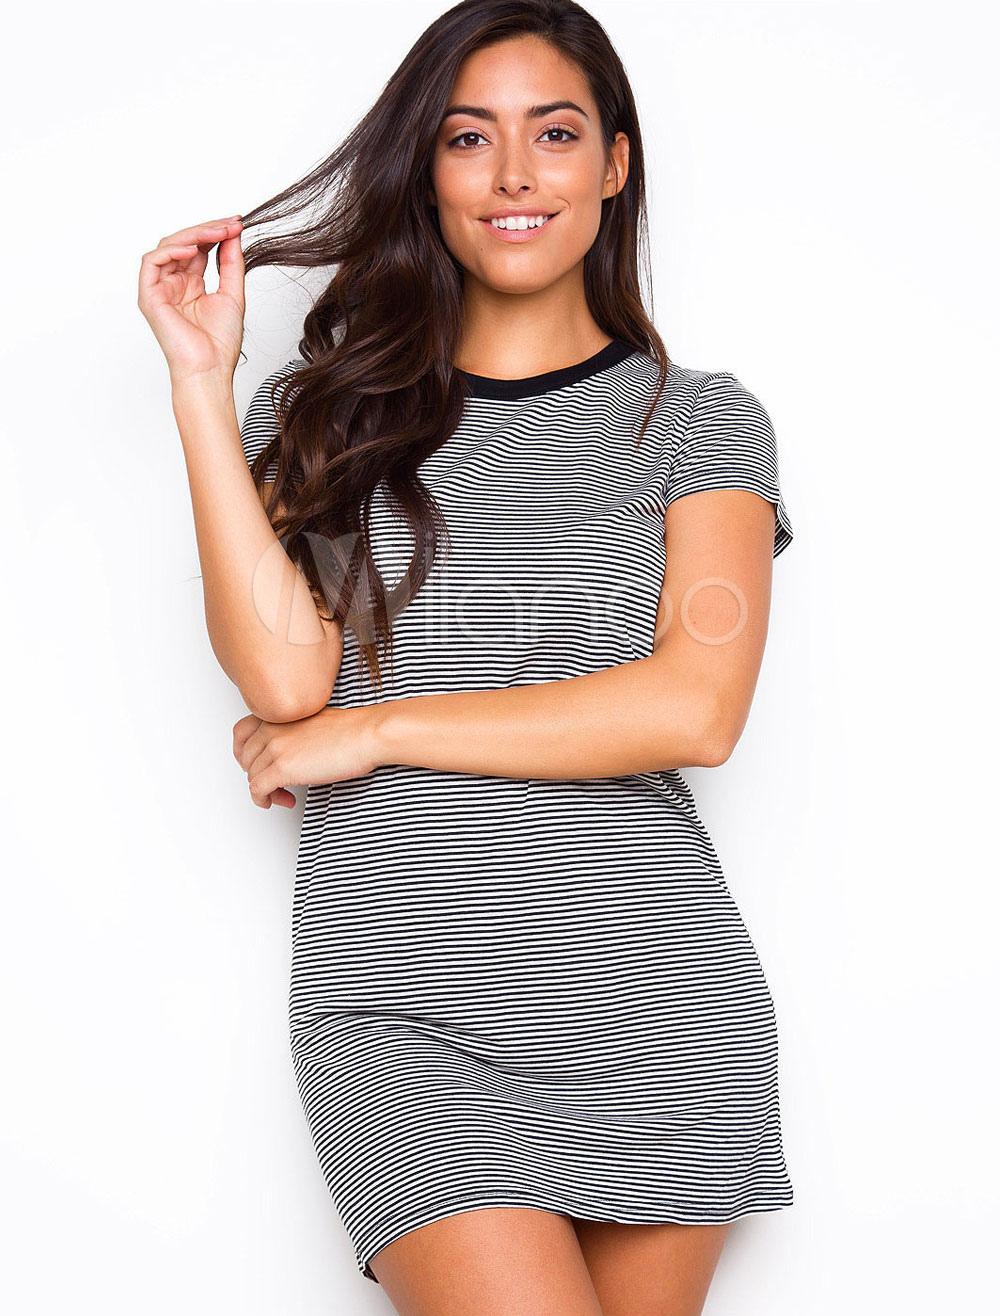 Buy T Shirt Dress Black Round Neck Short Sleeve Striped Women's Short Dresses for $23.74 in Milanoo store